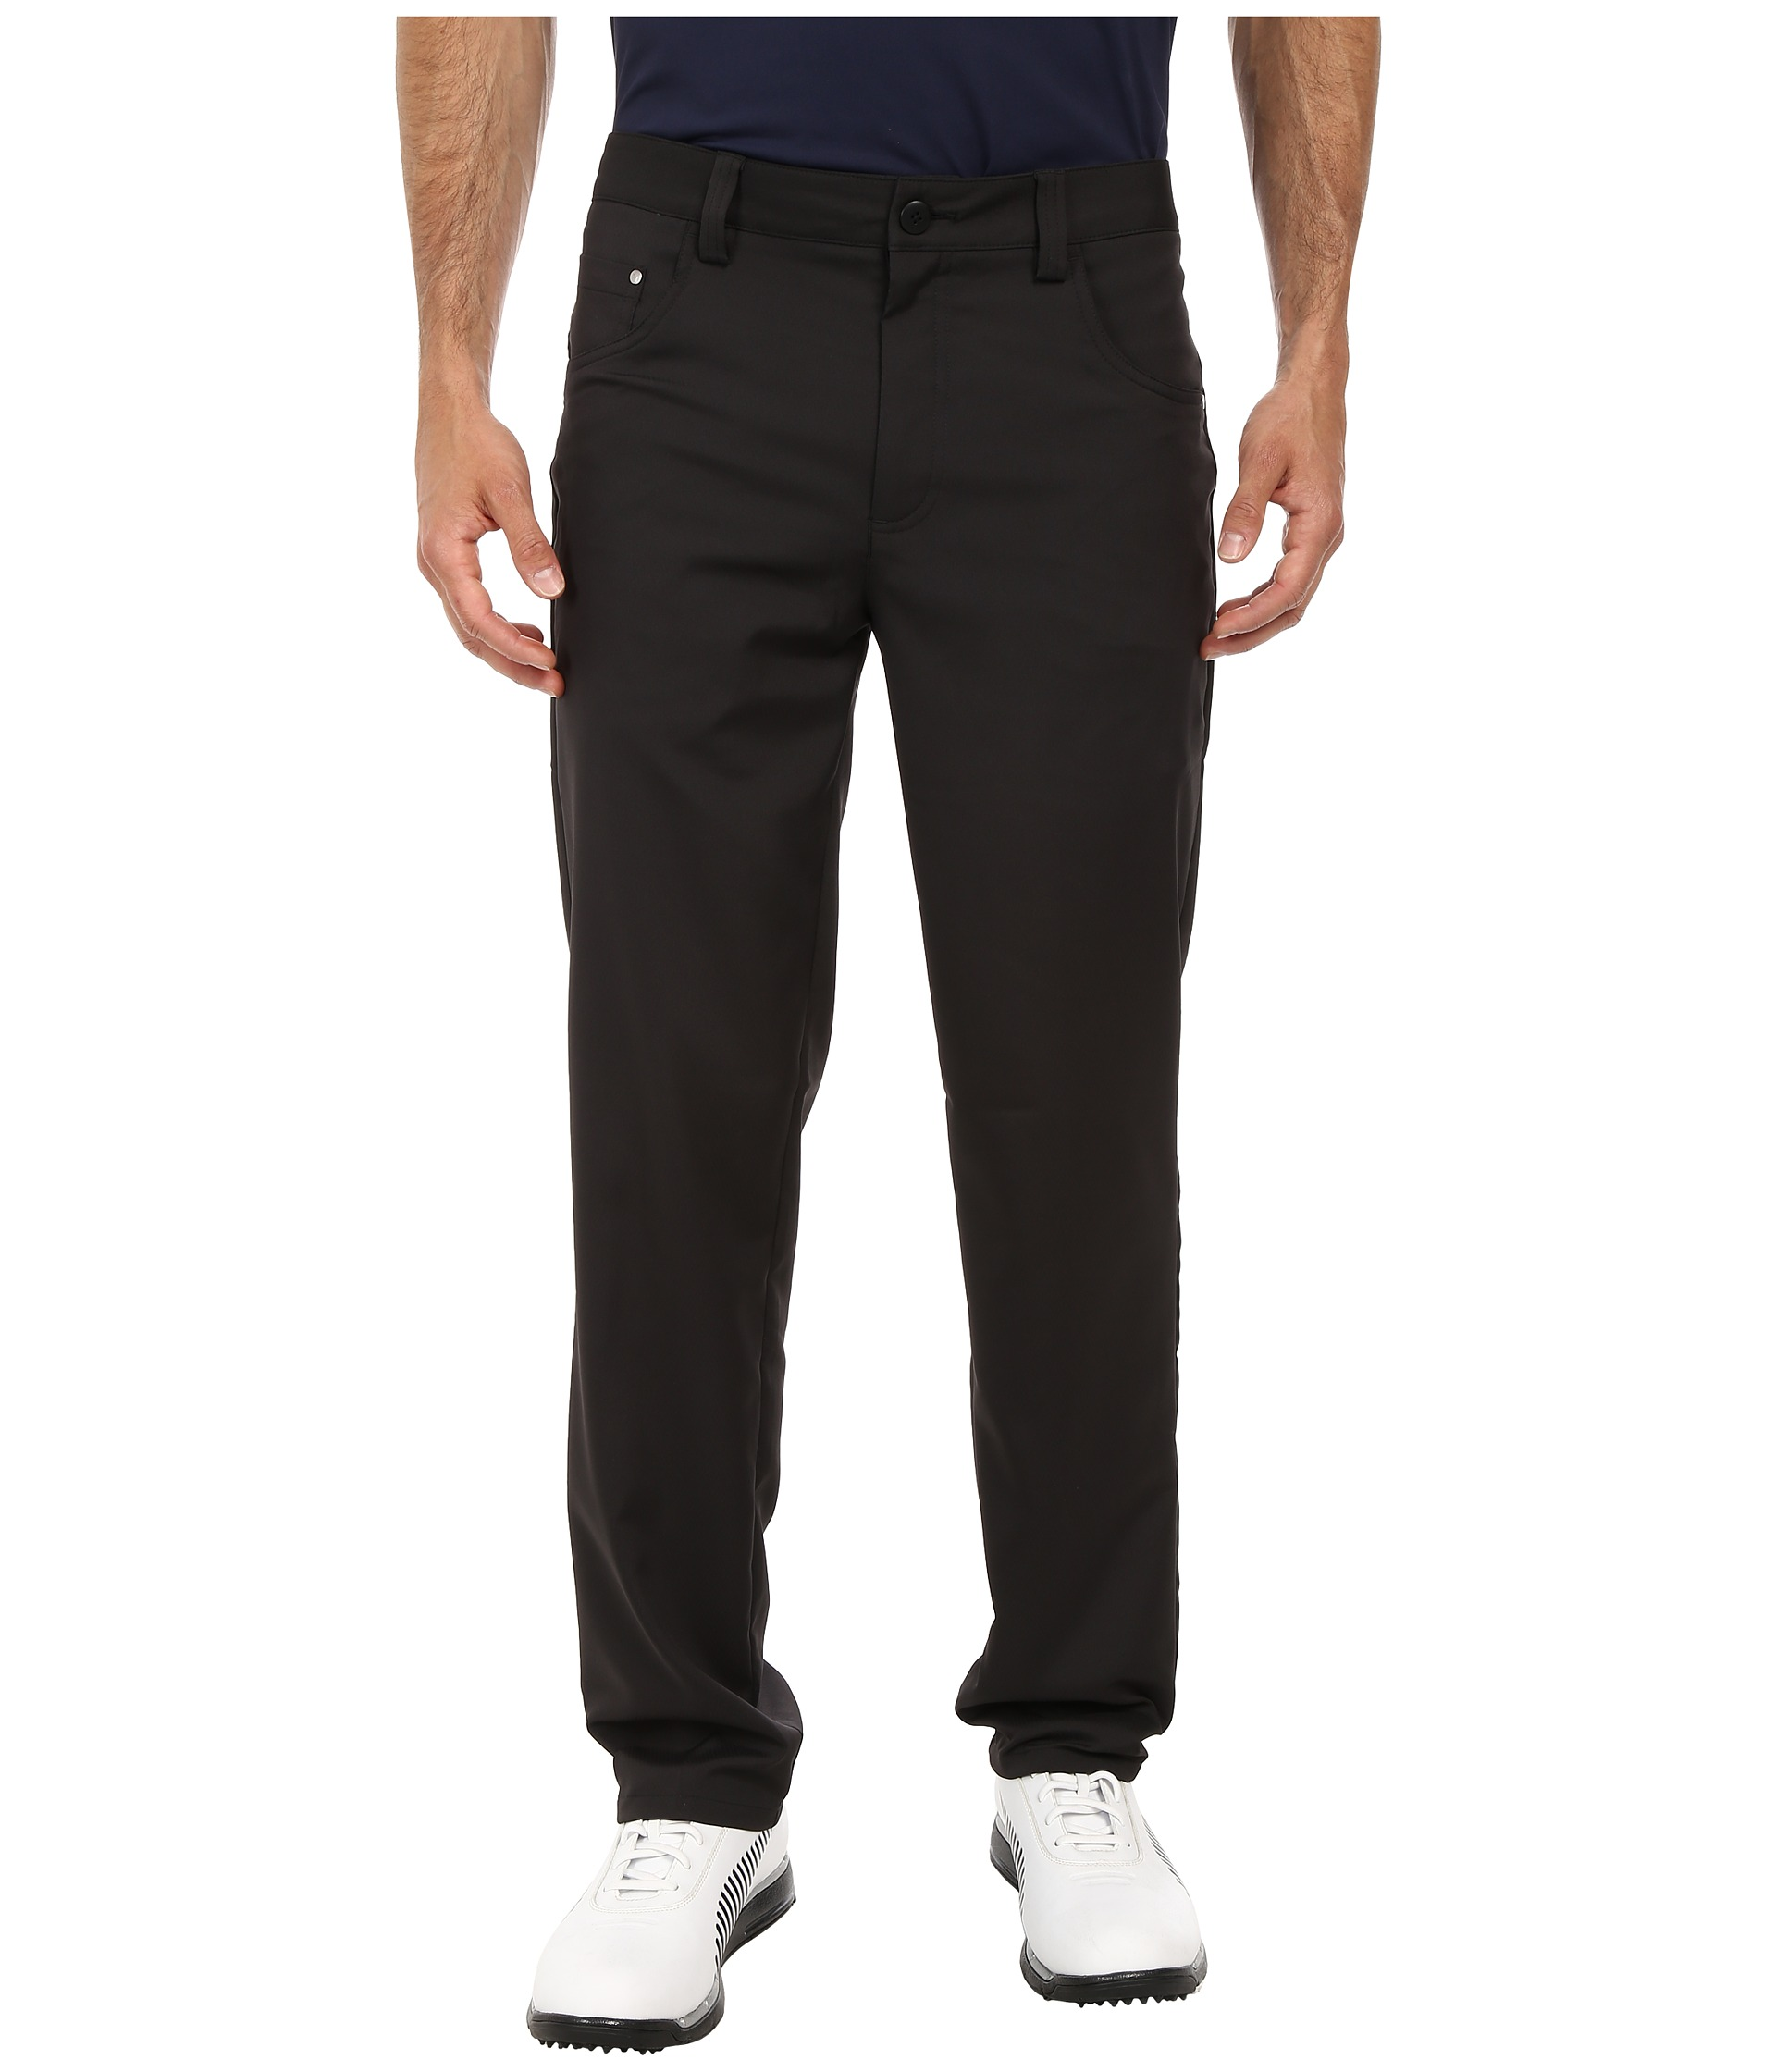 puma white golf pants